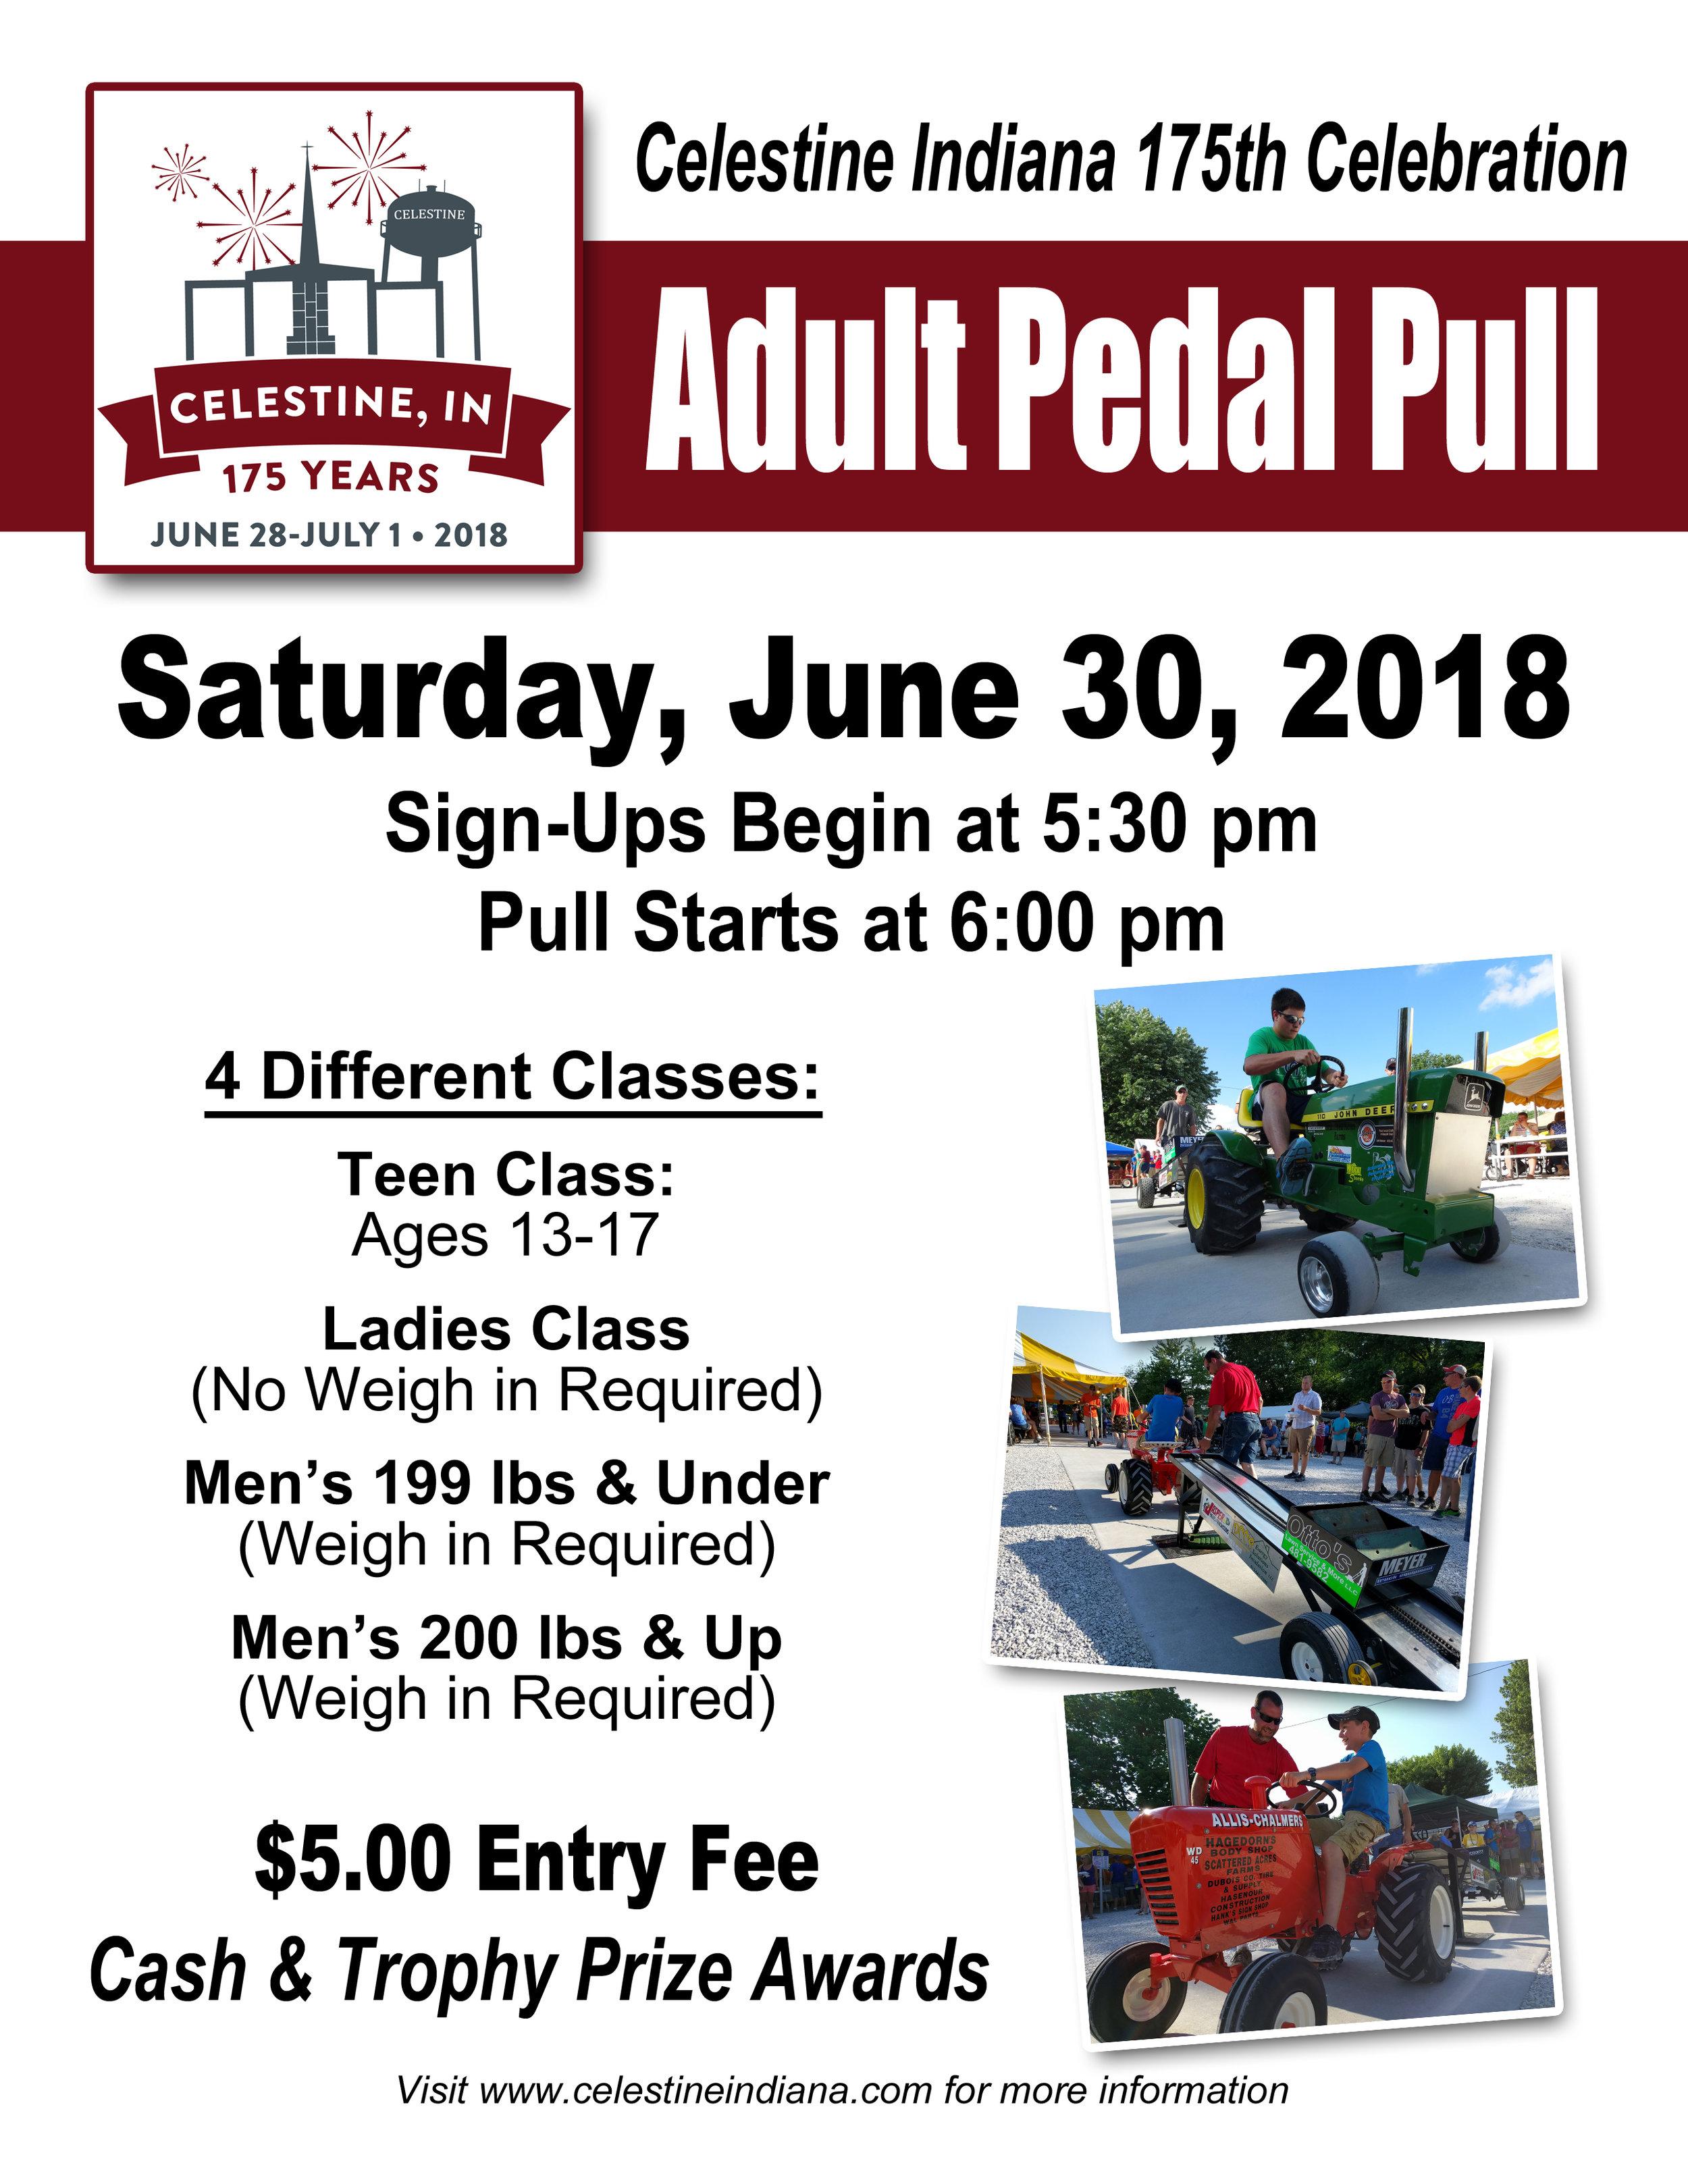 Adult Pedal Pull Flyer.jpg